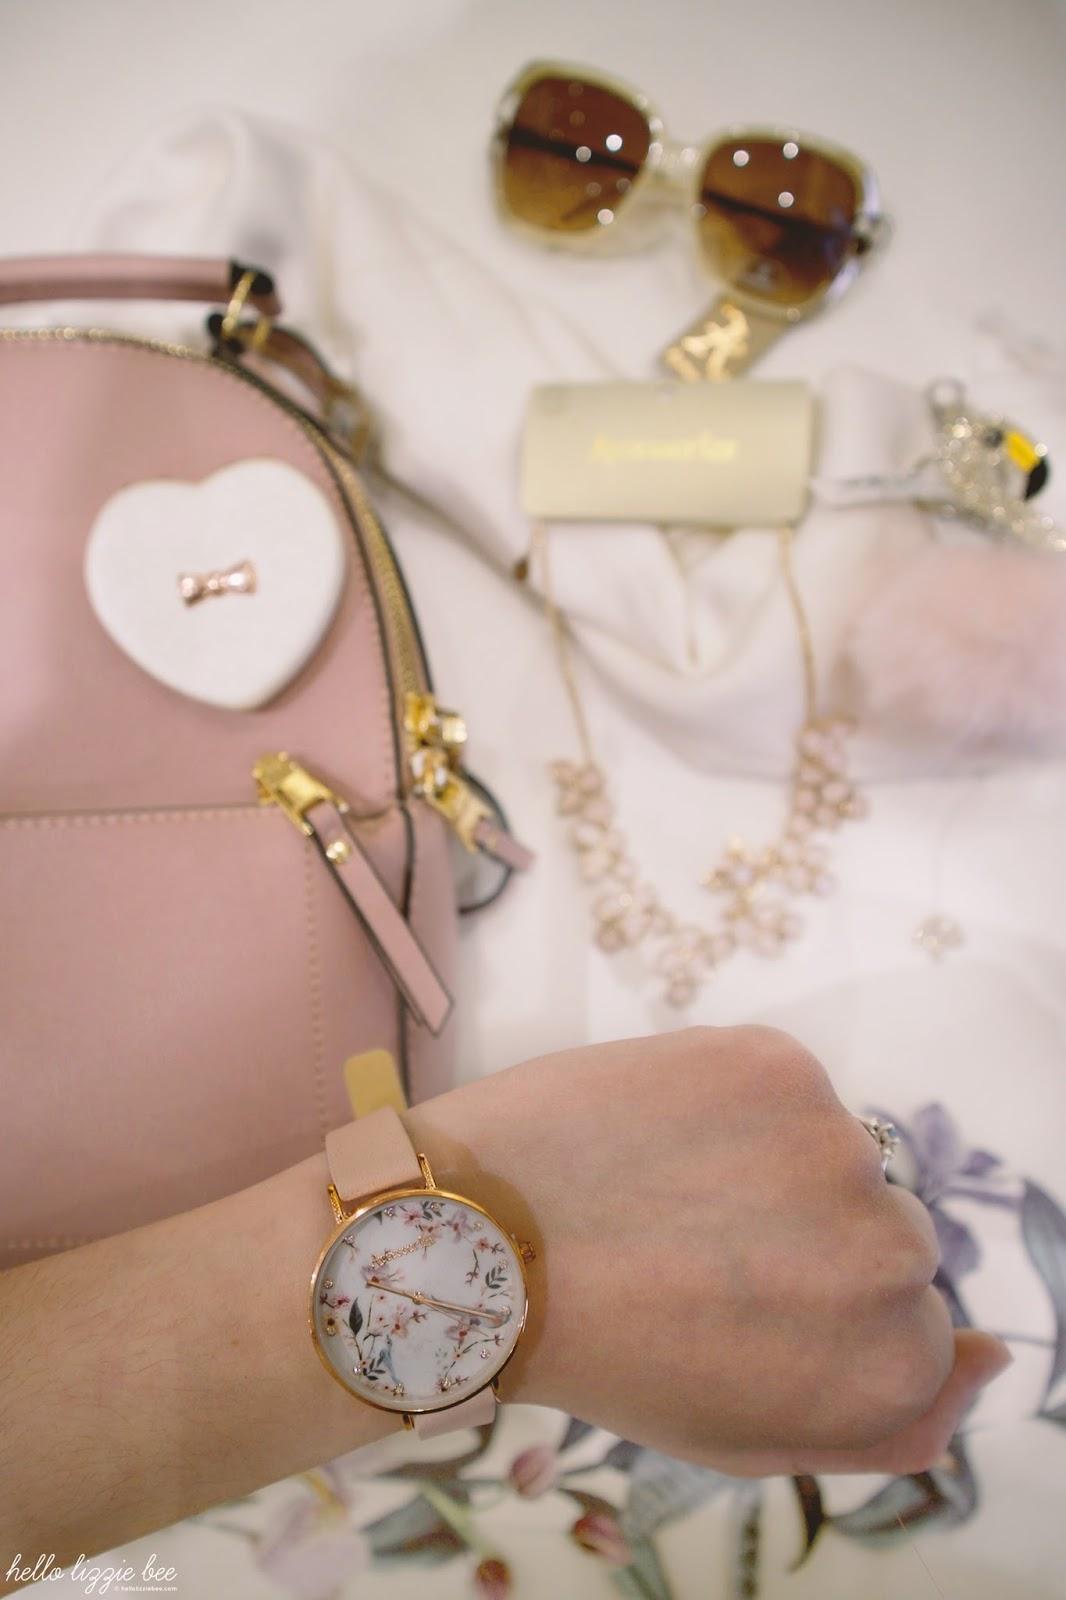 spring accessories, flatlay, accessorize